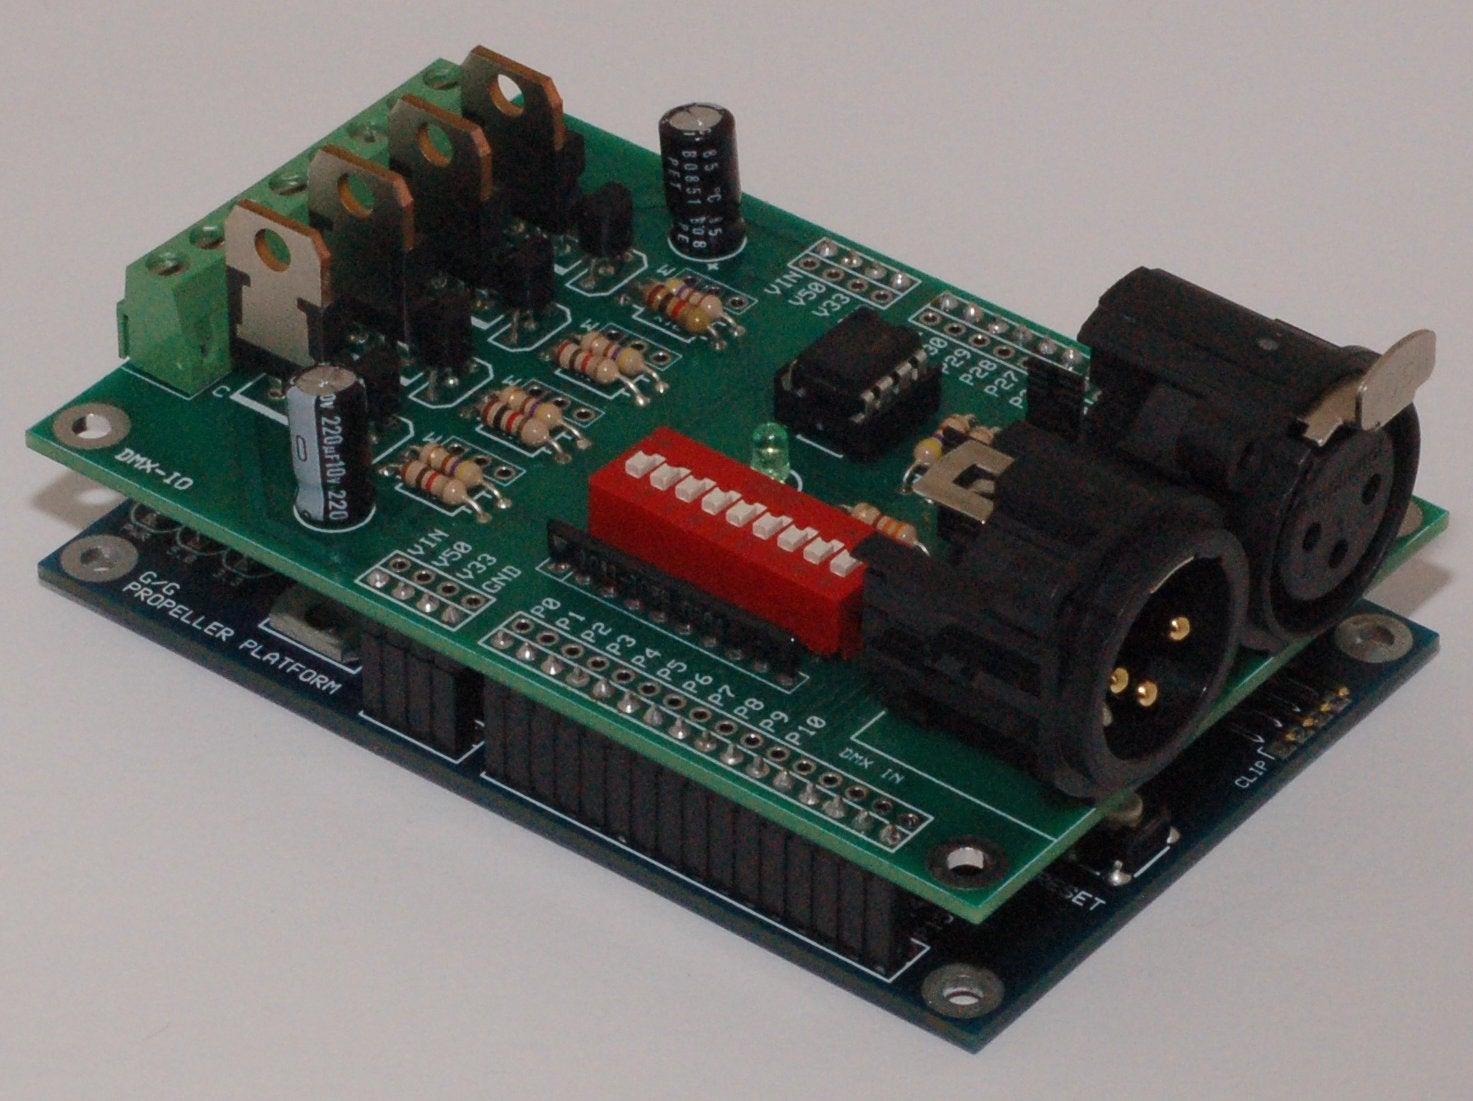 4 Channel Dmx Transceiver 24 Steps Control Wiring Diagram Free Download Schematic